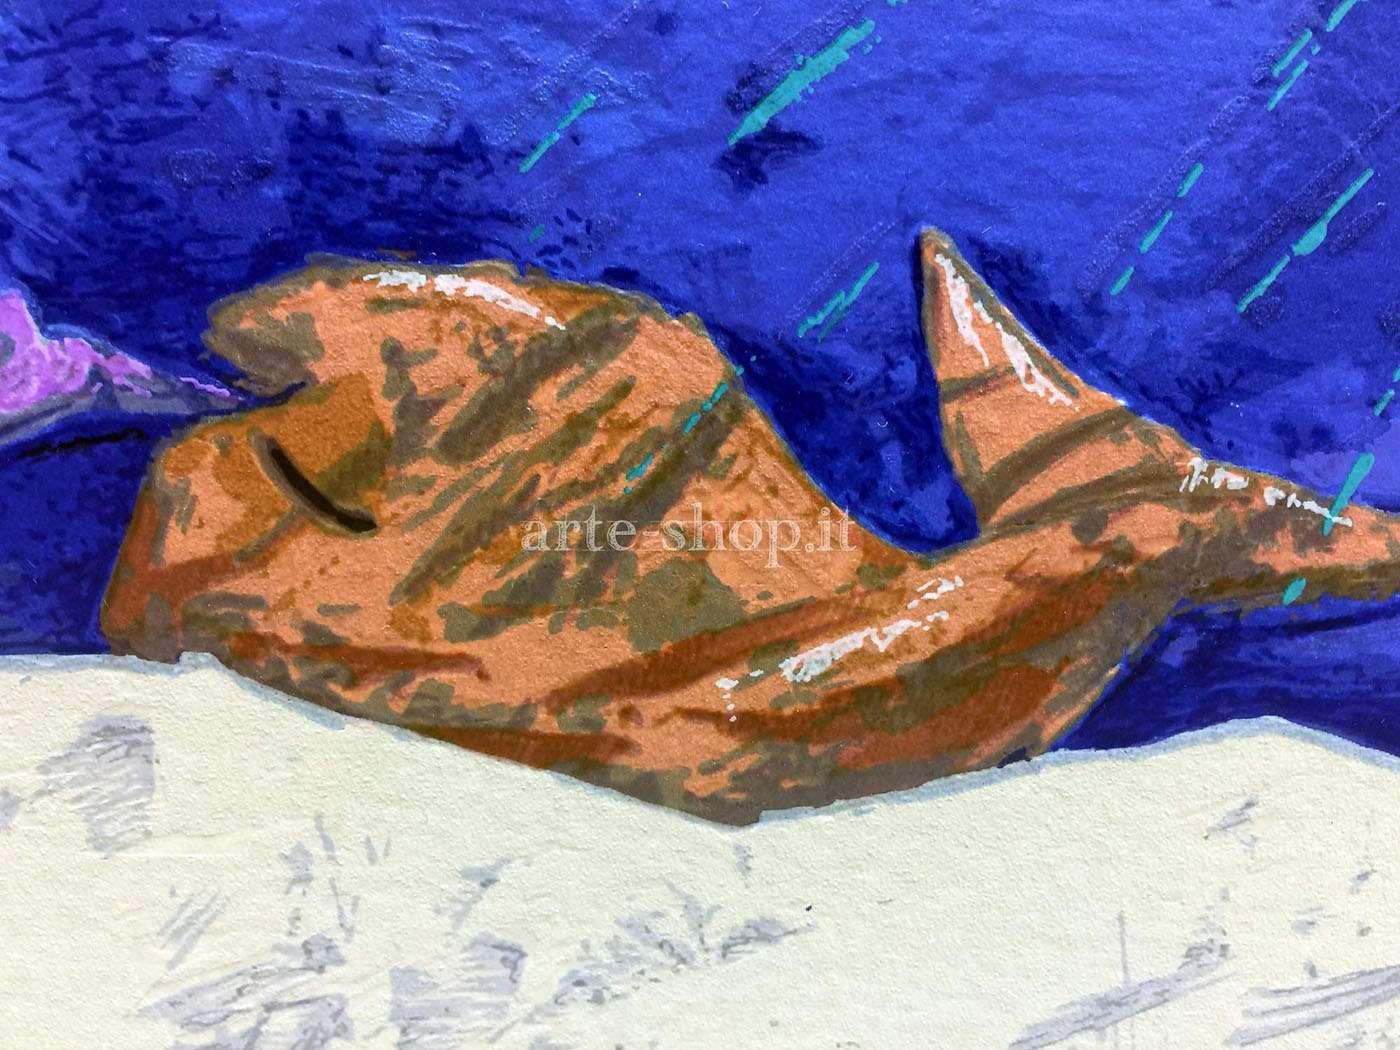 arte pentagono shop dettaglio numero 153